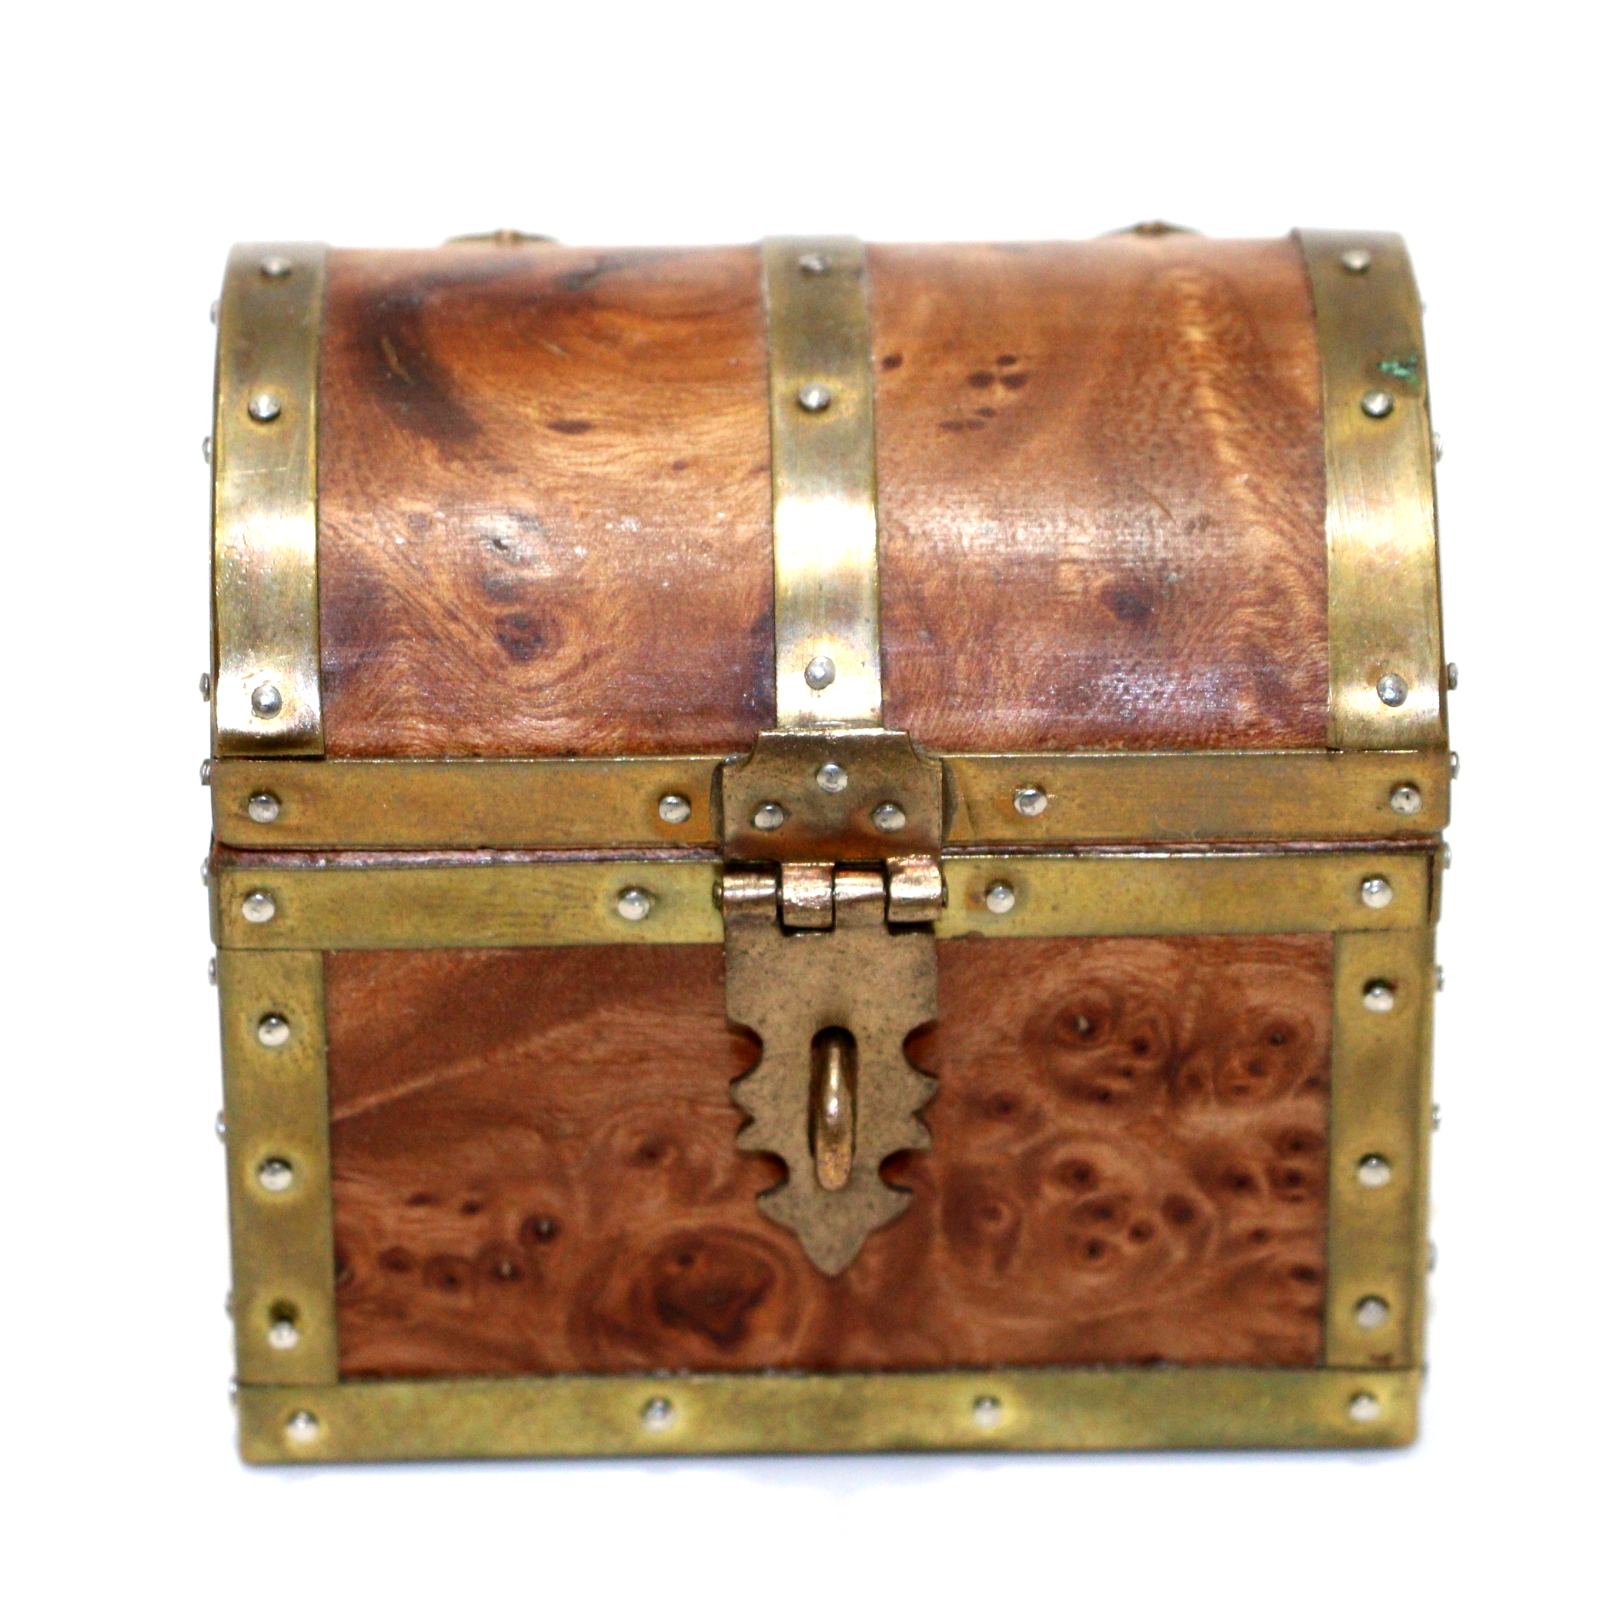 Lippincot Box by Mark Teufel